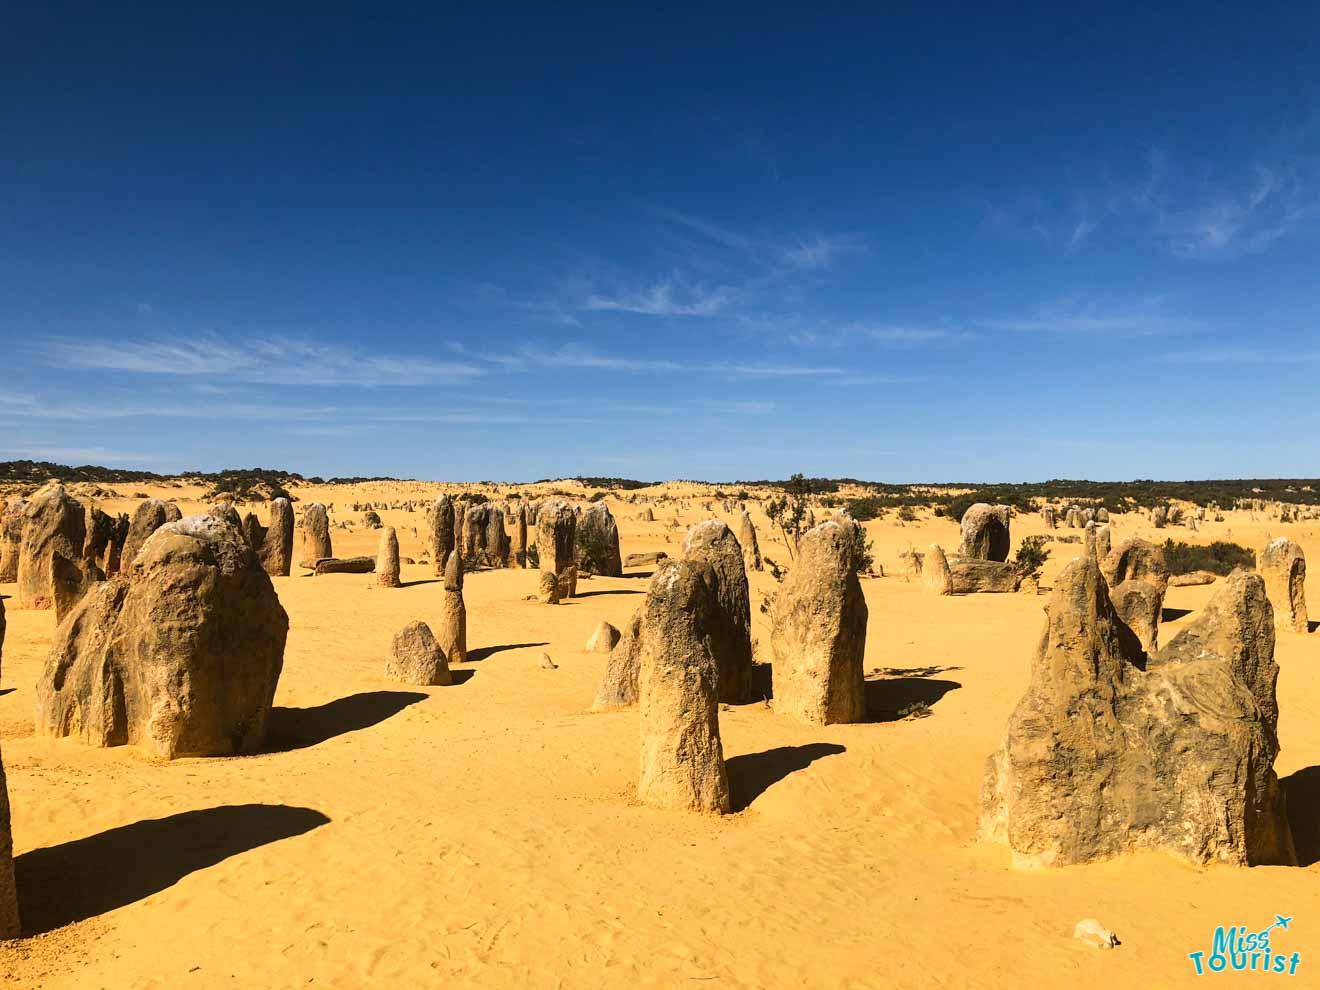 sands Western Australia Road trip blog